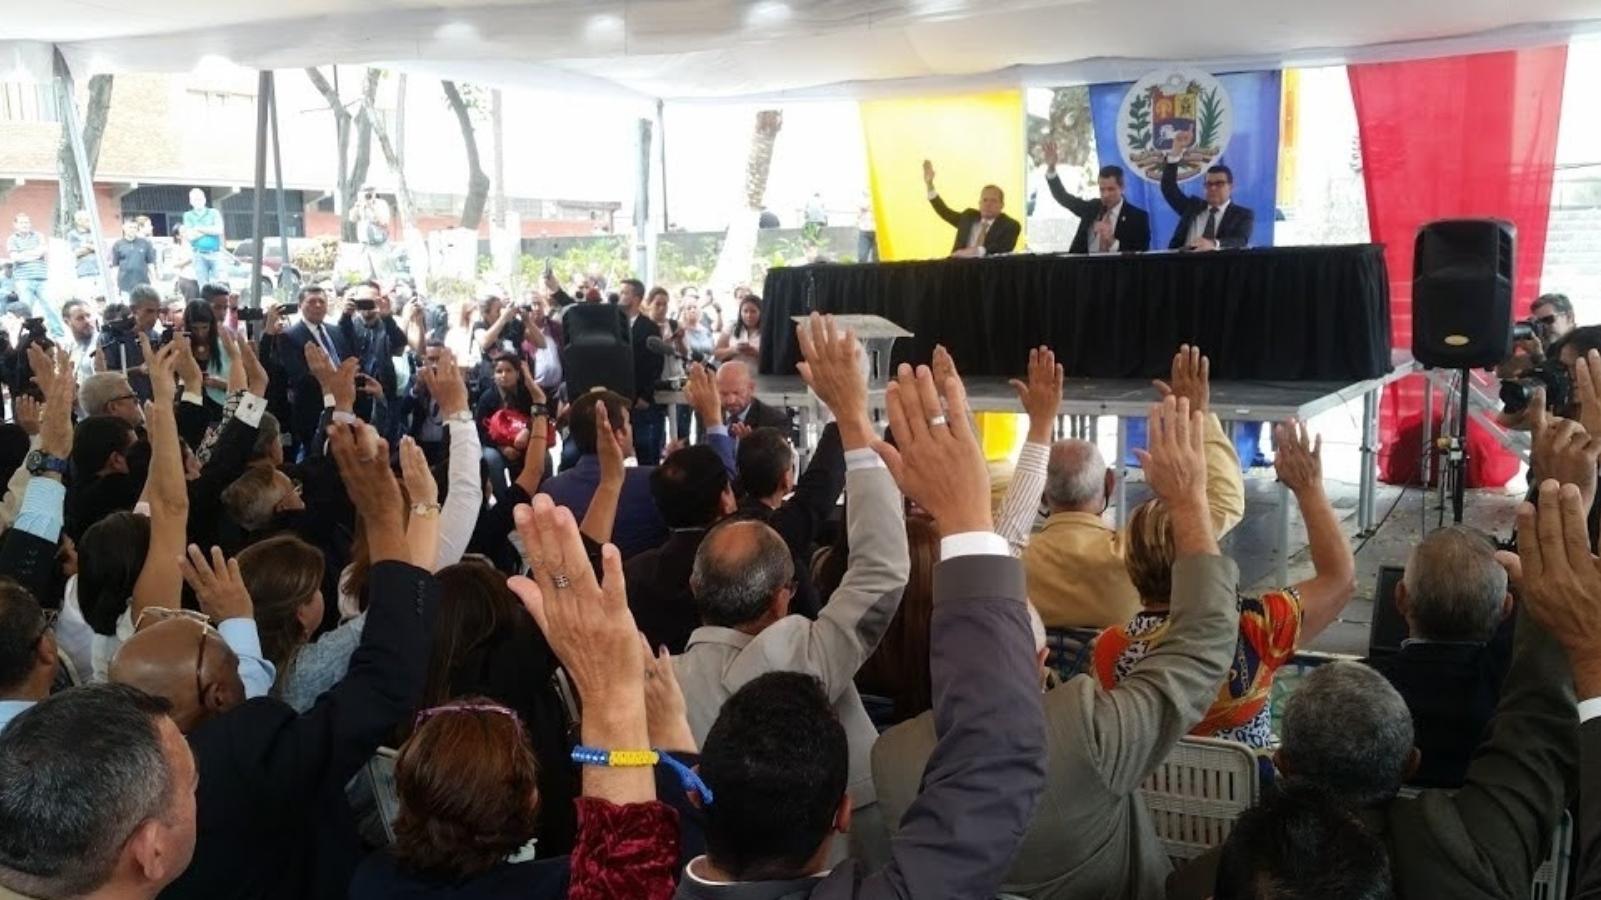 Parlamento venezolano exige respeto con los migrantes